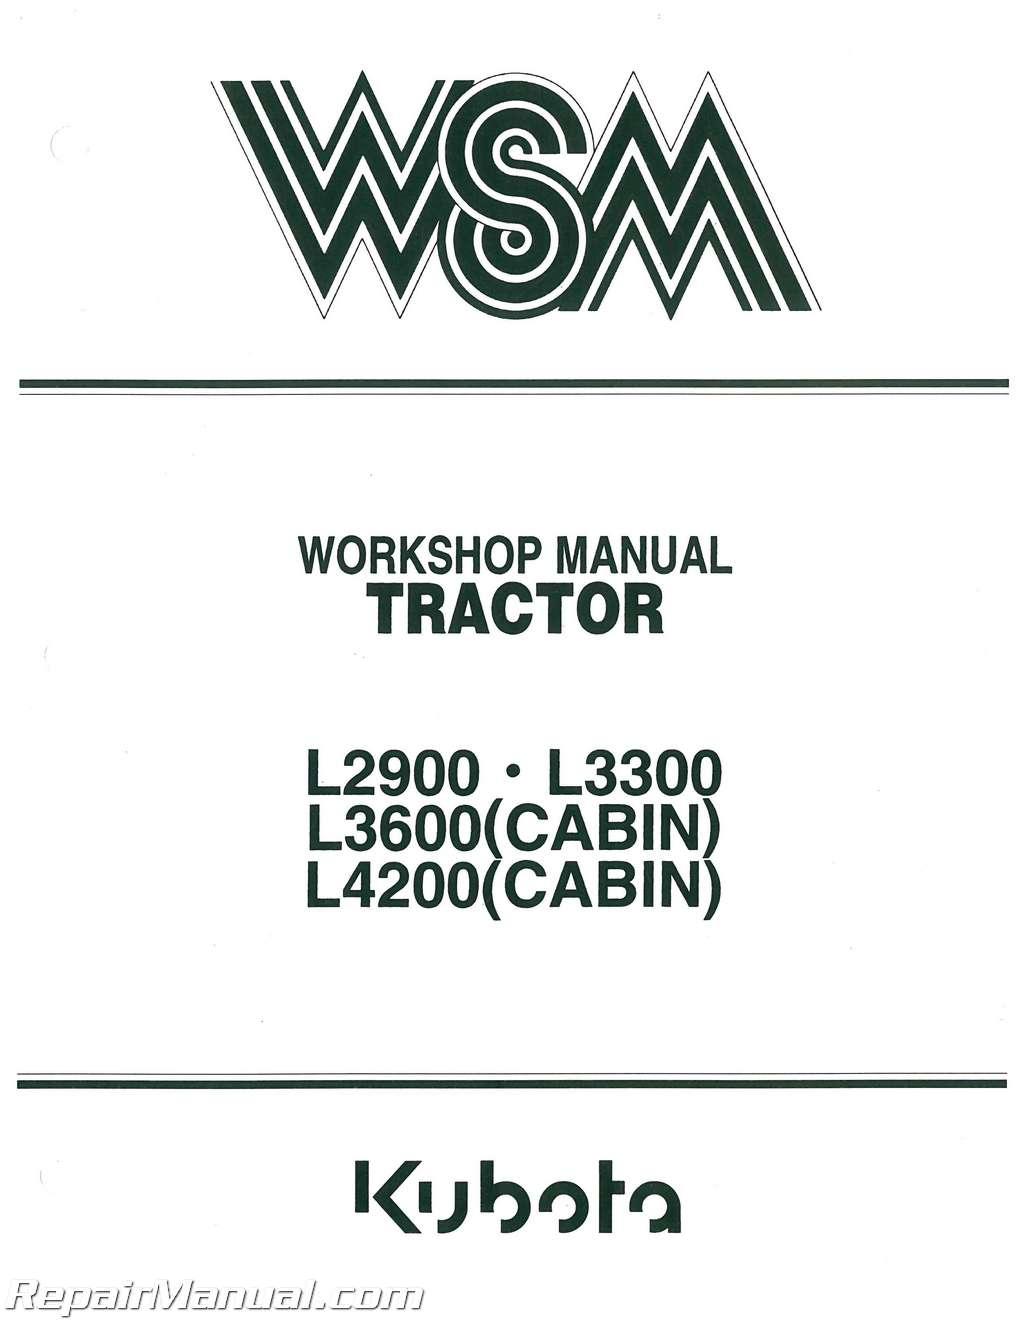 Kubota tractor manuals repair manuals online sciox Images